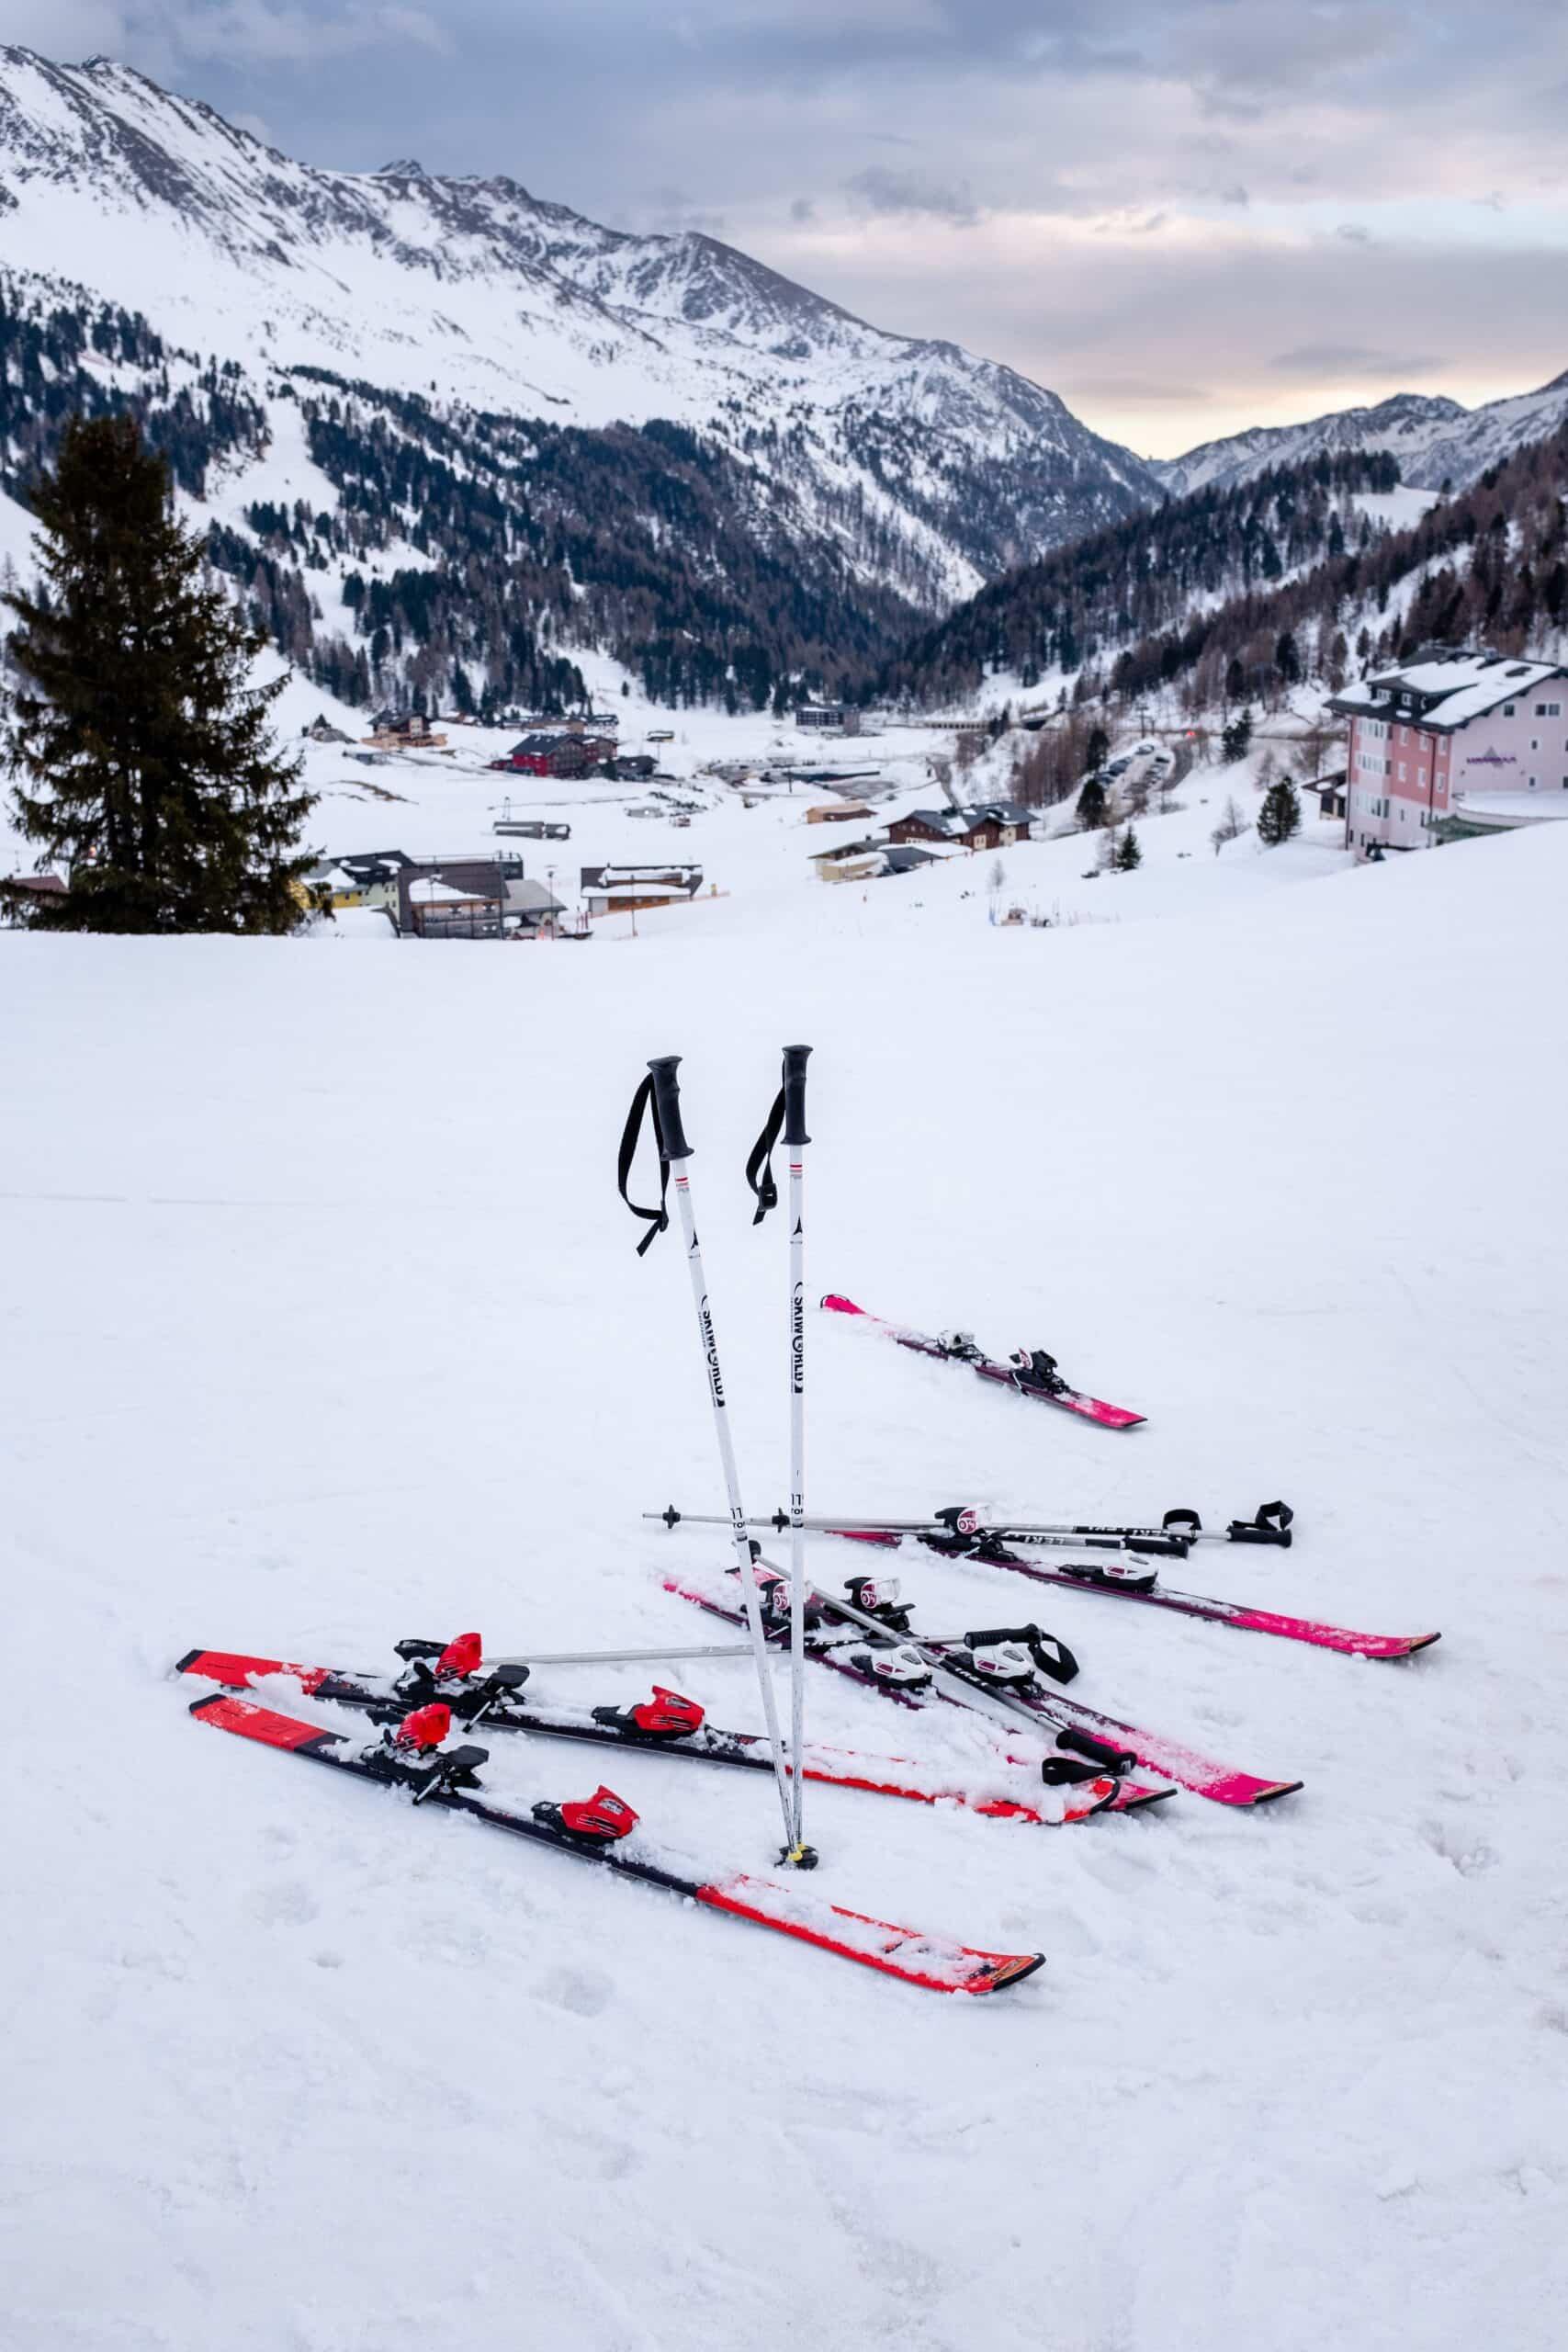 detuned skis